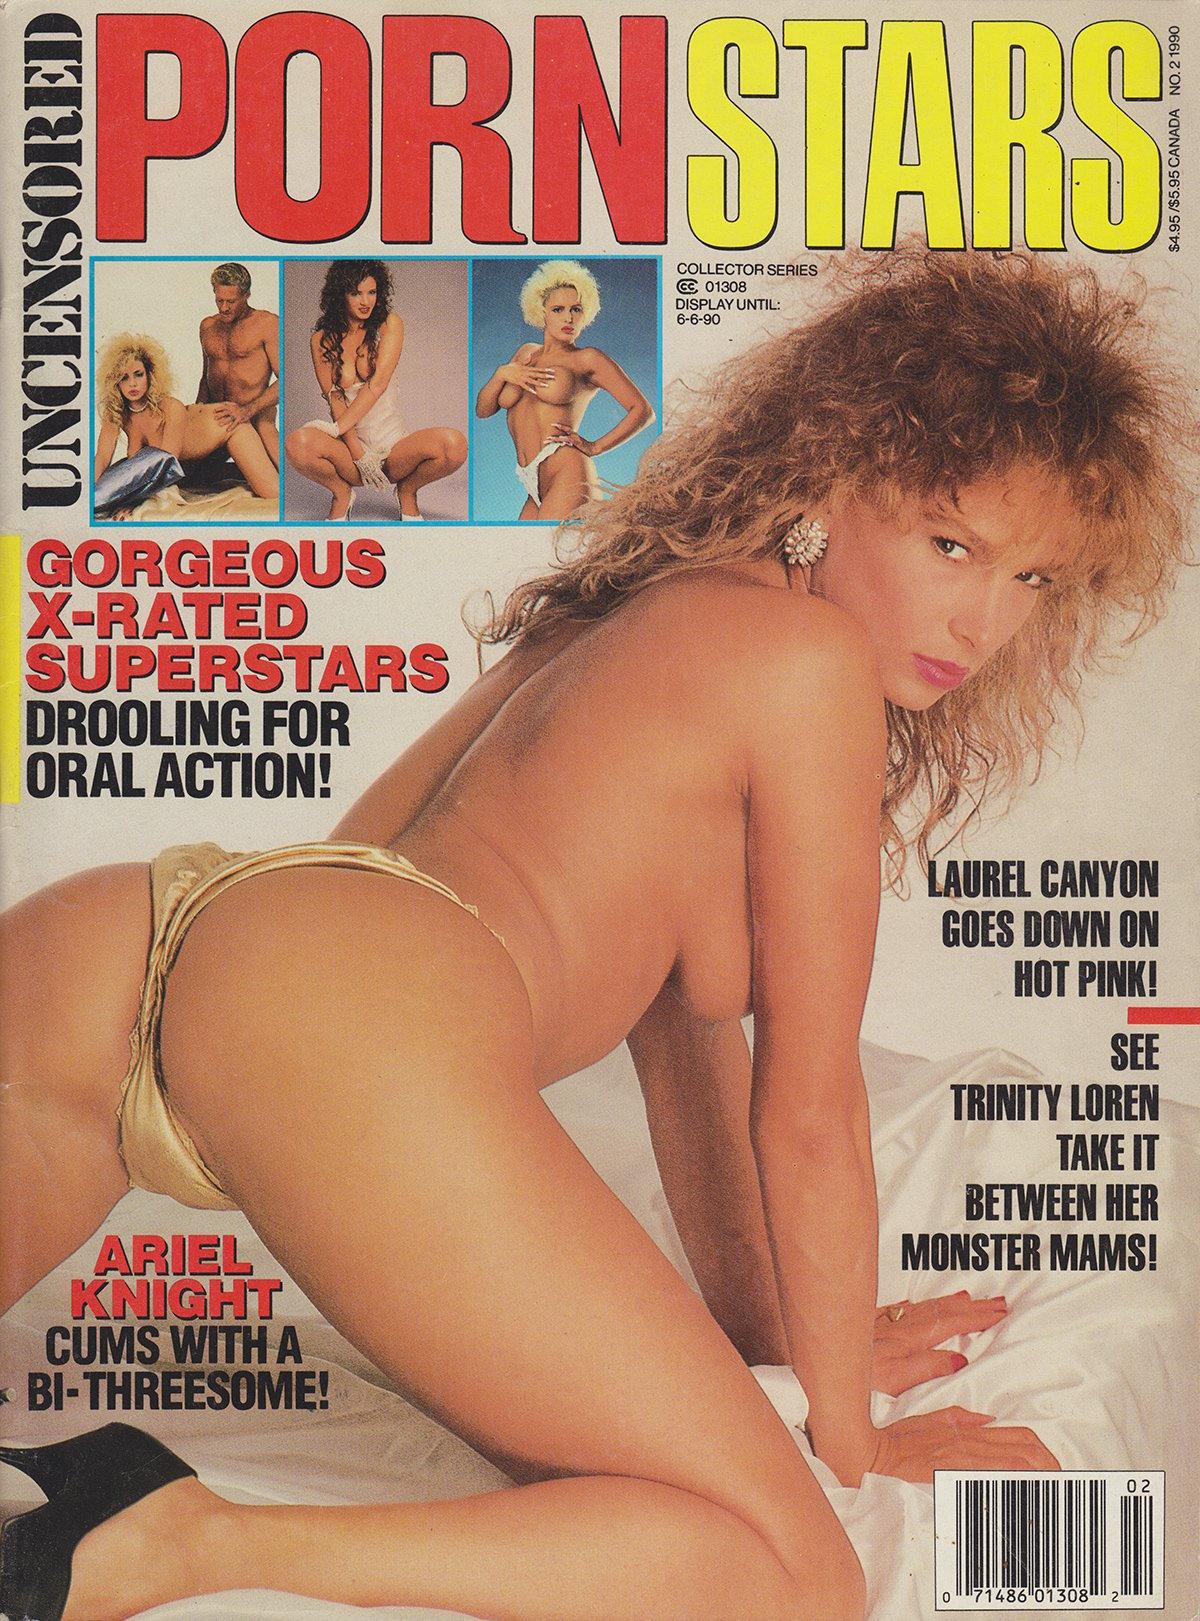 Swank Collector Series June 1990 - Uncensored Porn Stars magazine back issue Swank Collector Series magizine back copy